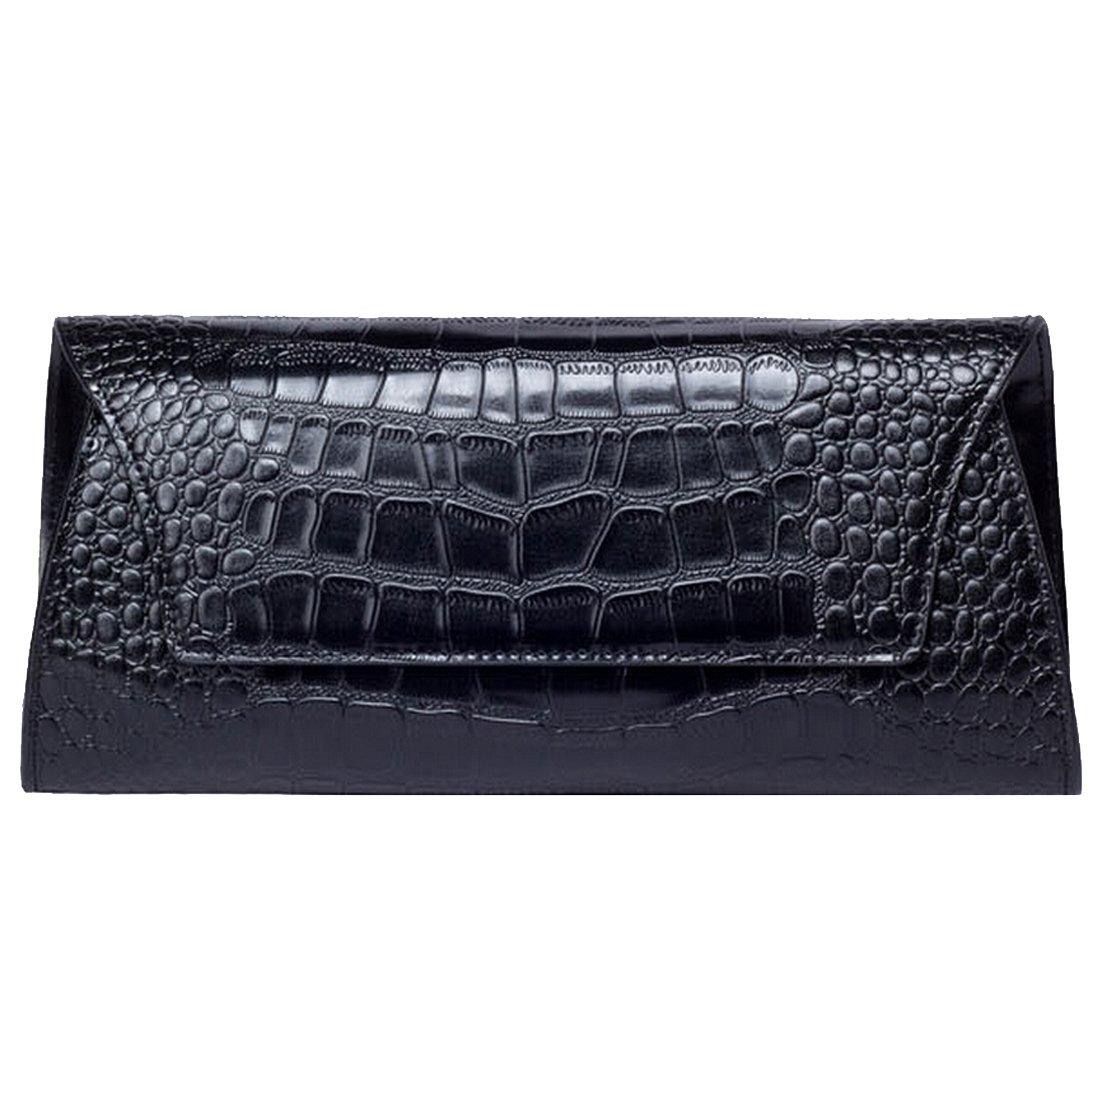 Missmay Women's Genuine Leather Handbag Shoulder Bag Purse Clutch White